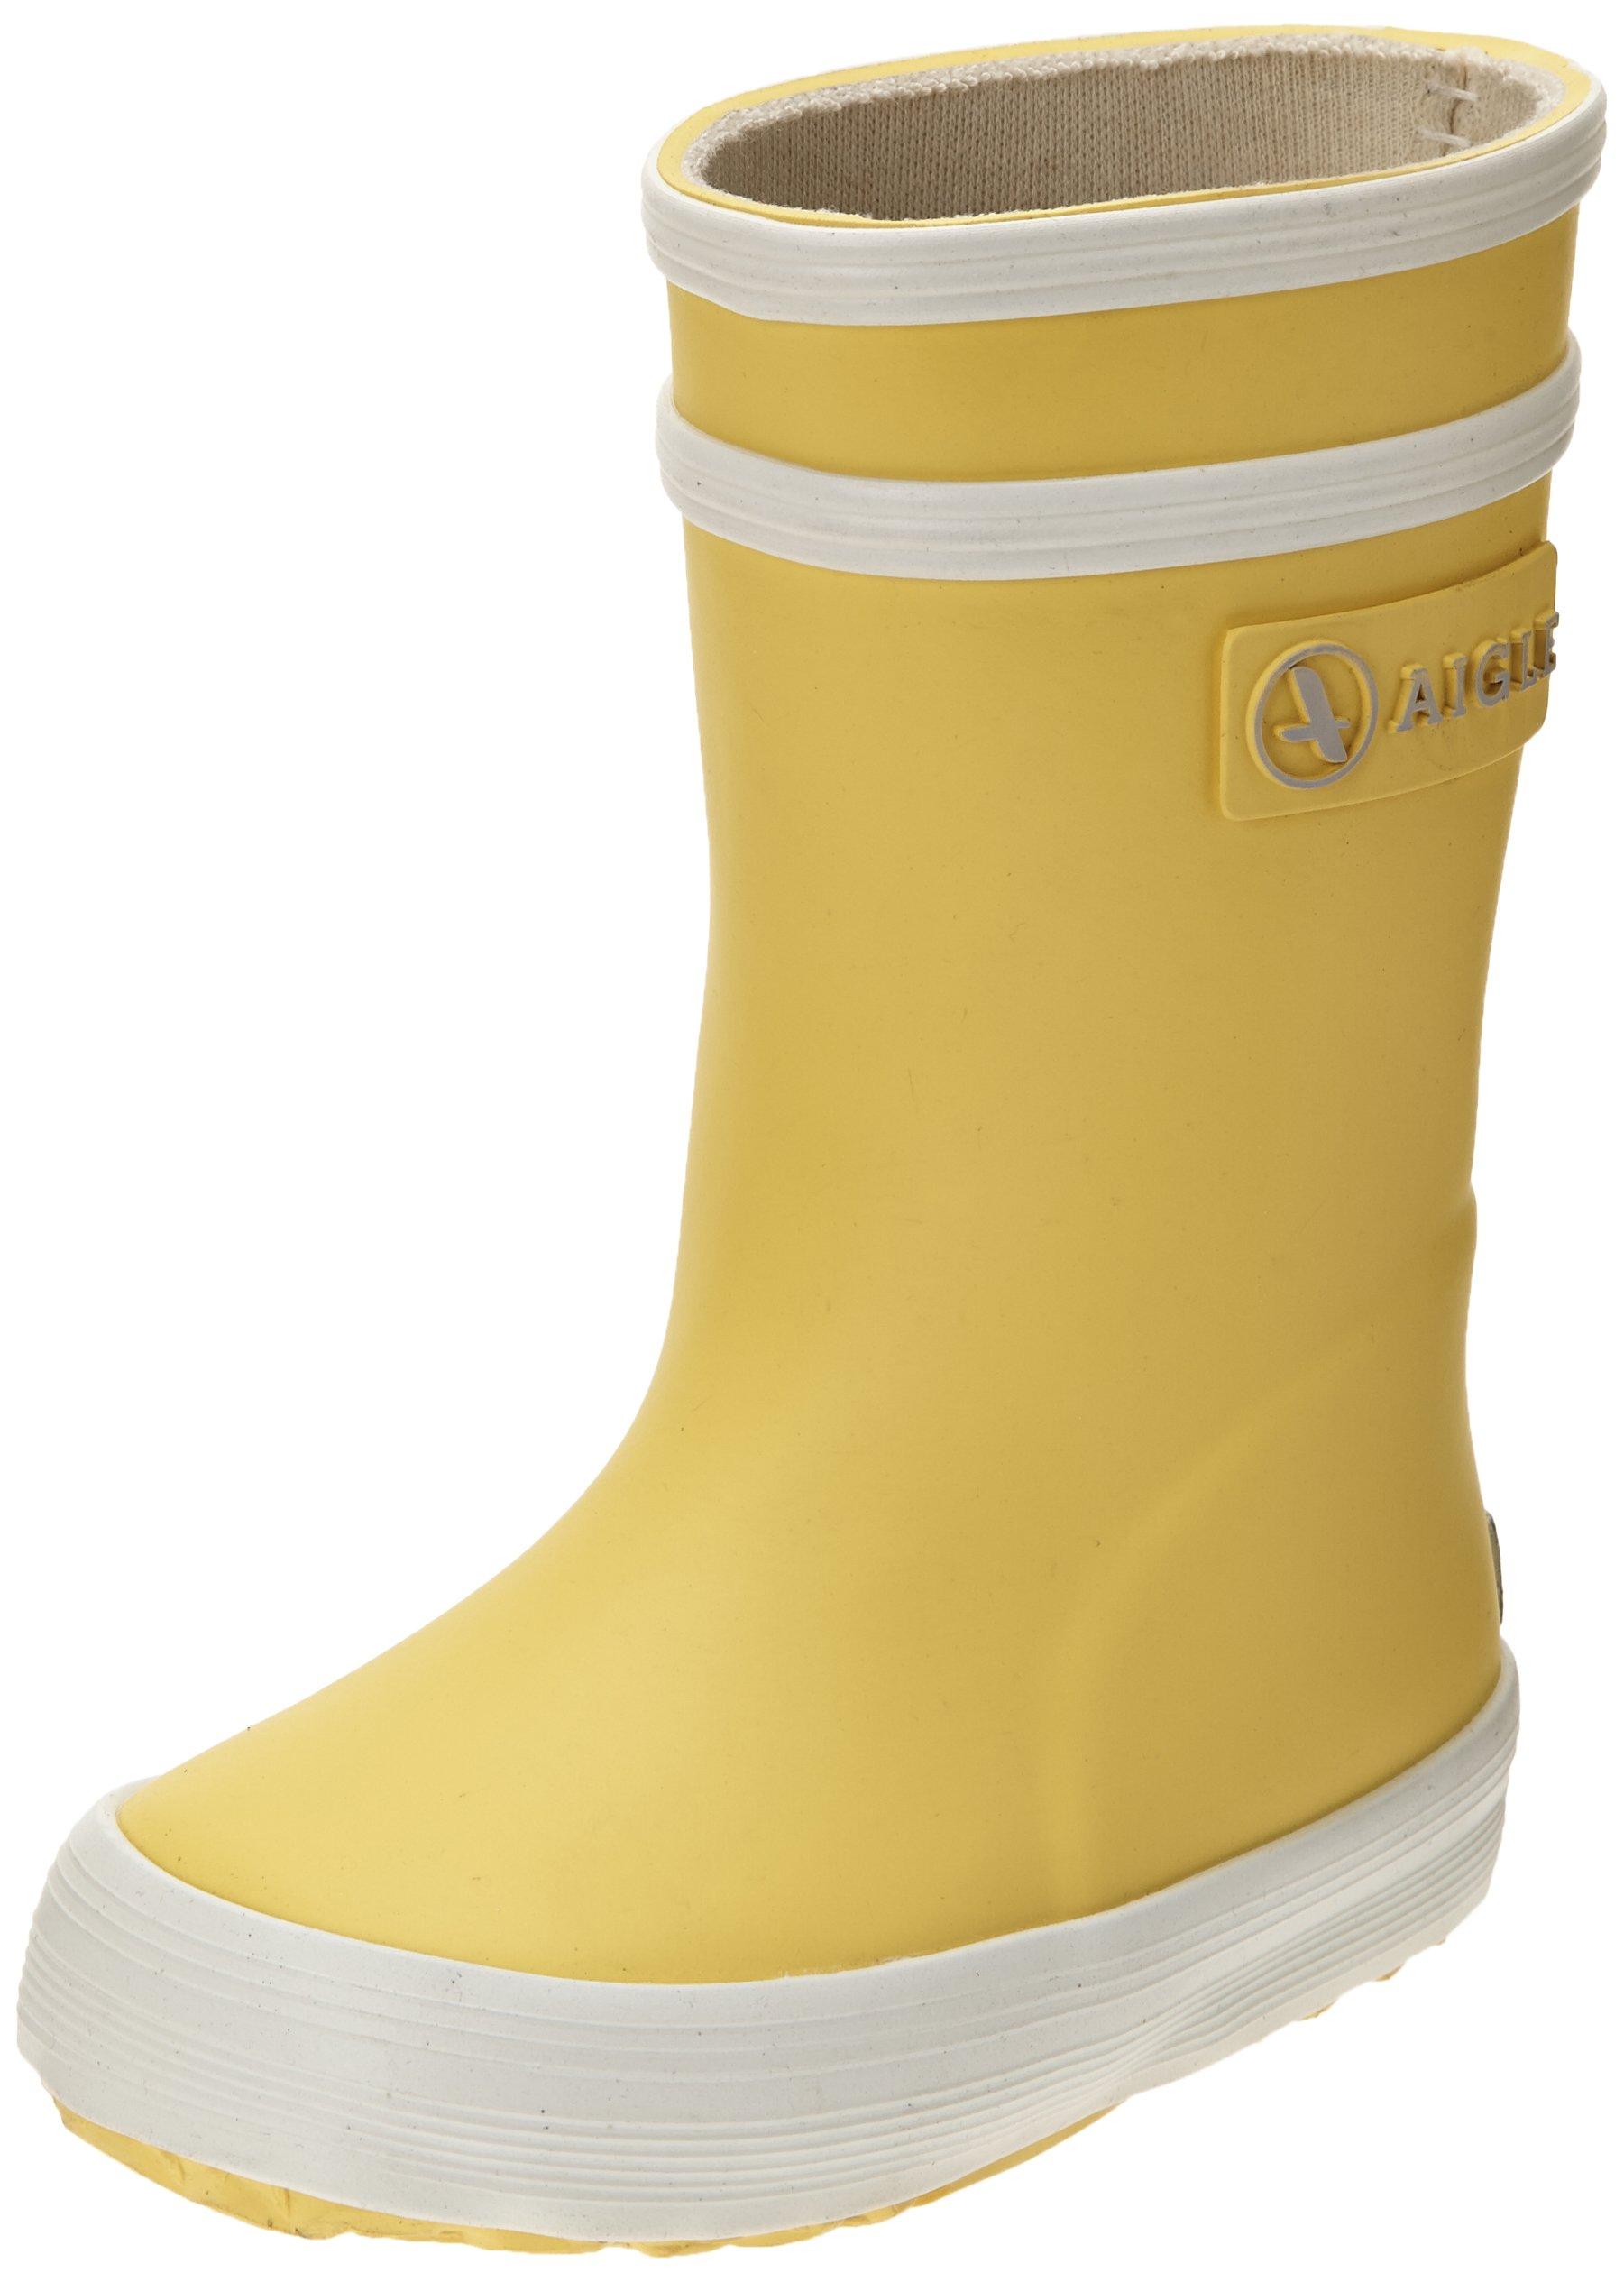 new arrivals 14189 29f33 UK Kids' Boots New 001) Aigle Flac' Wellington Baby (Jaune ...